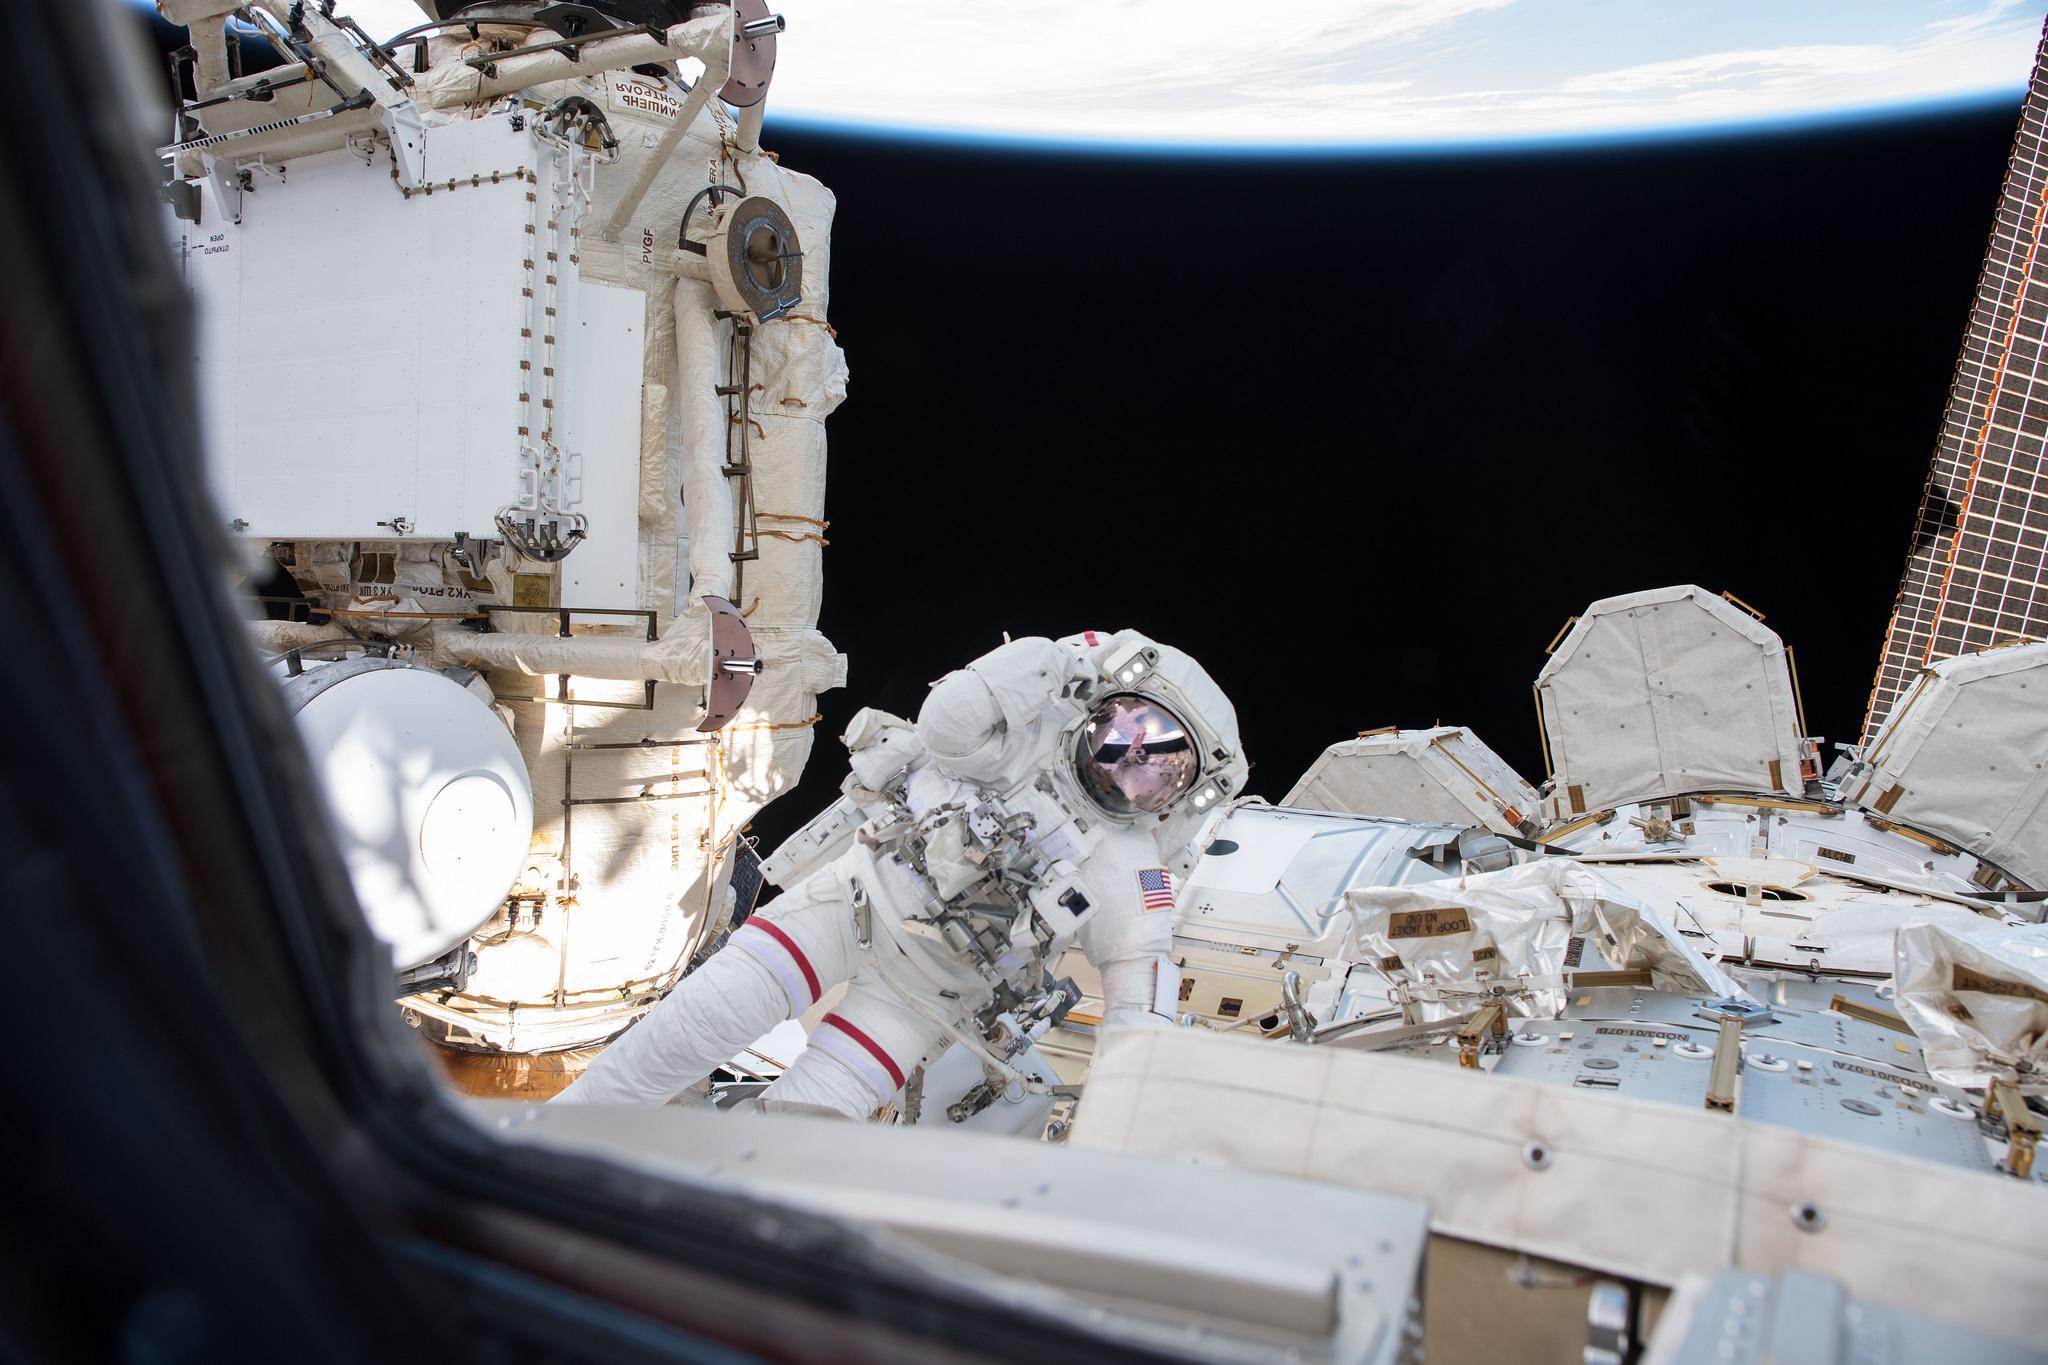 NASA astronaut Drew Feustel during U.S. EVA-49. Credit: NASA